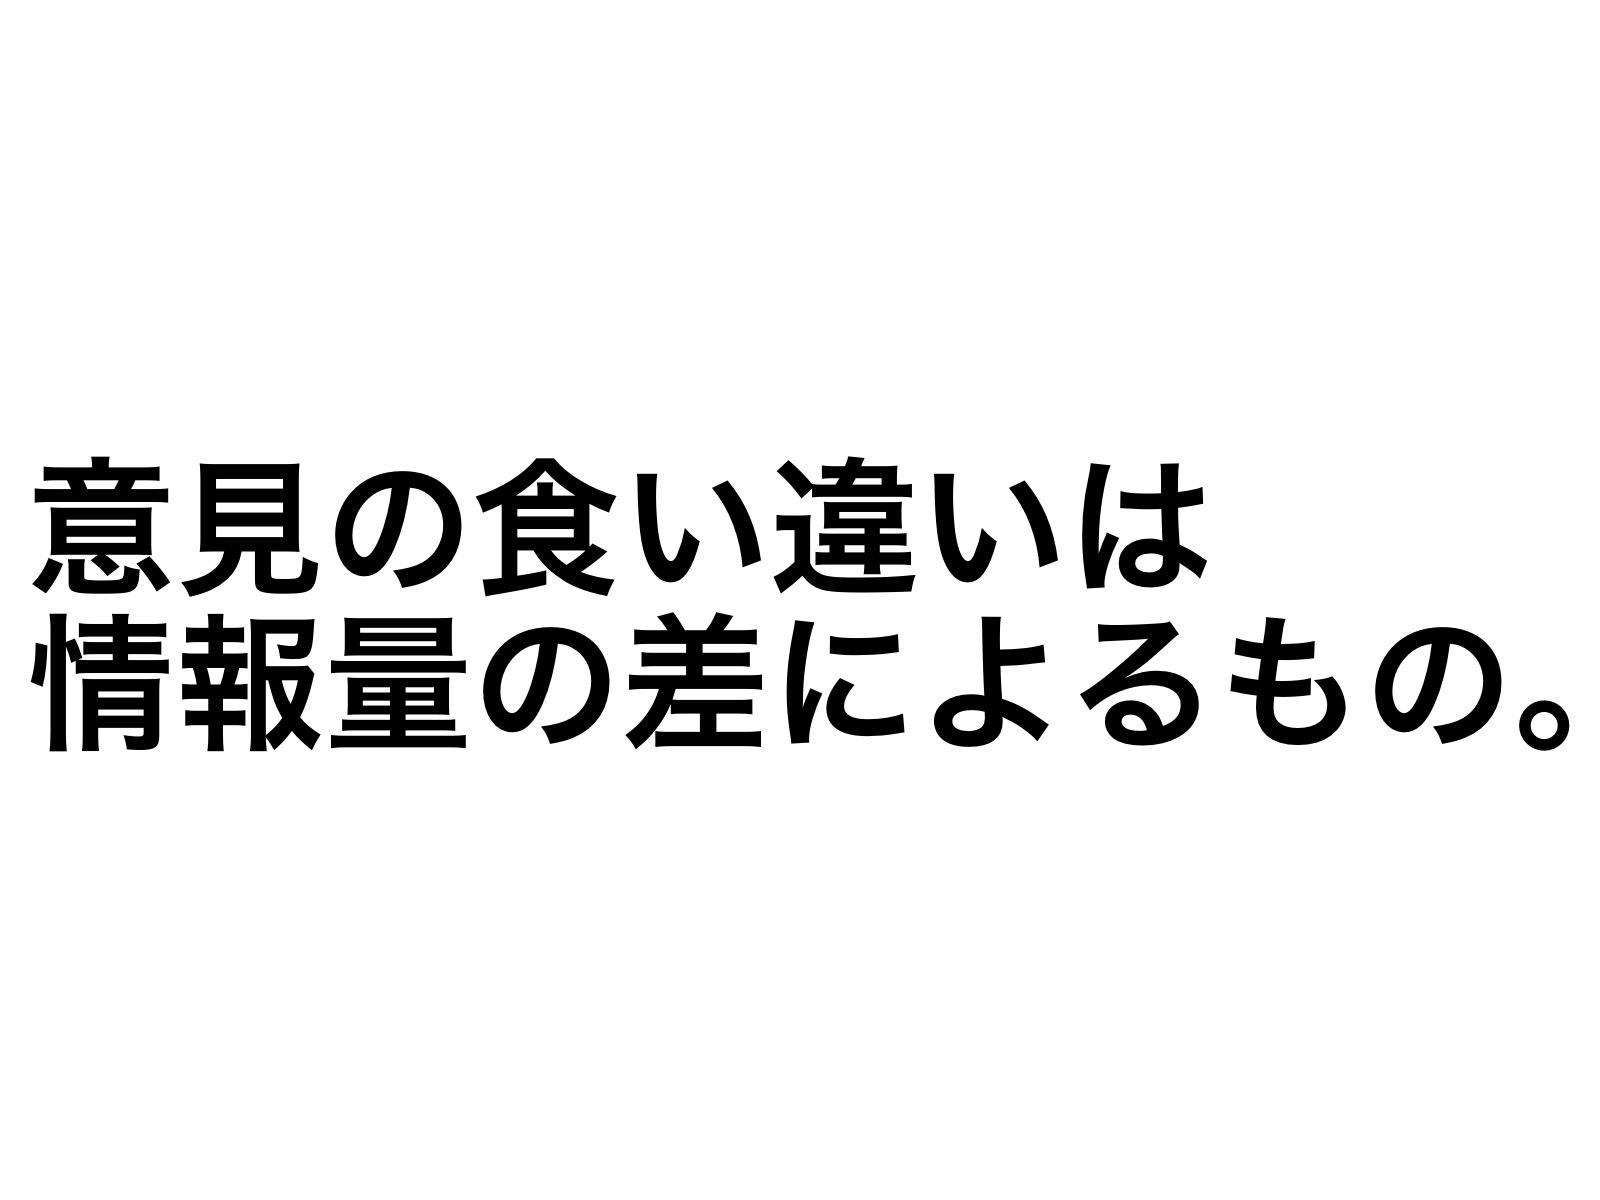 2016 11 01 20 46 13